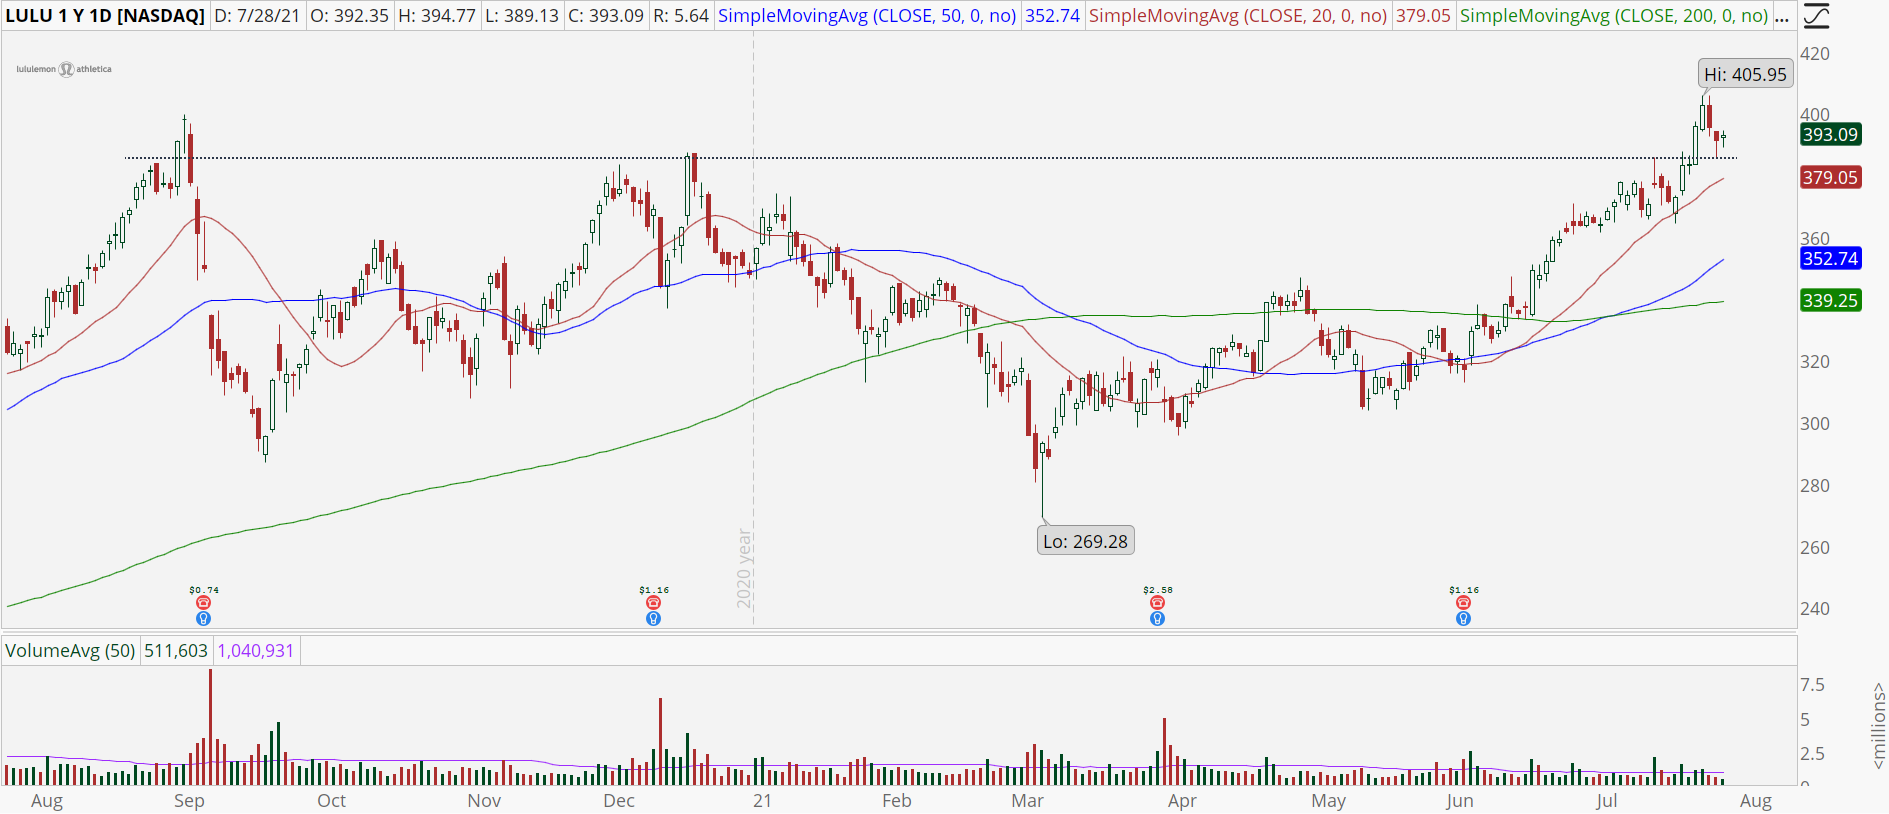 Lululemon Athletica (LULU) stock chart with bull retracement